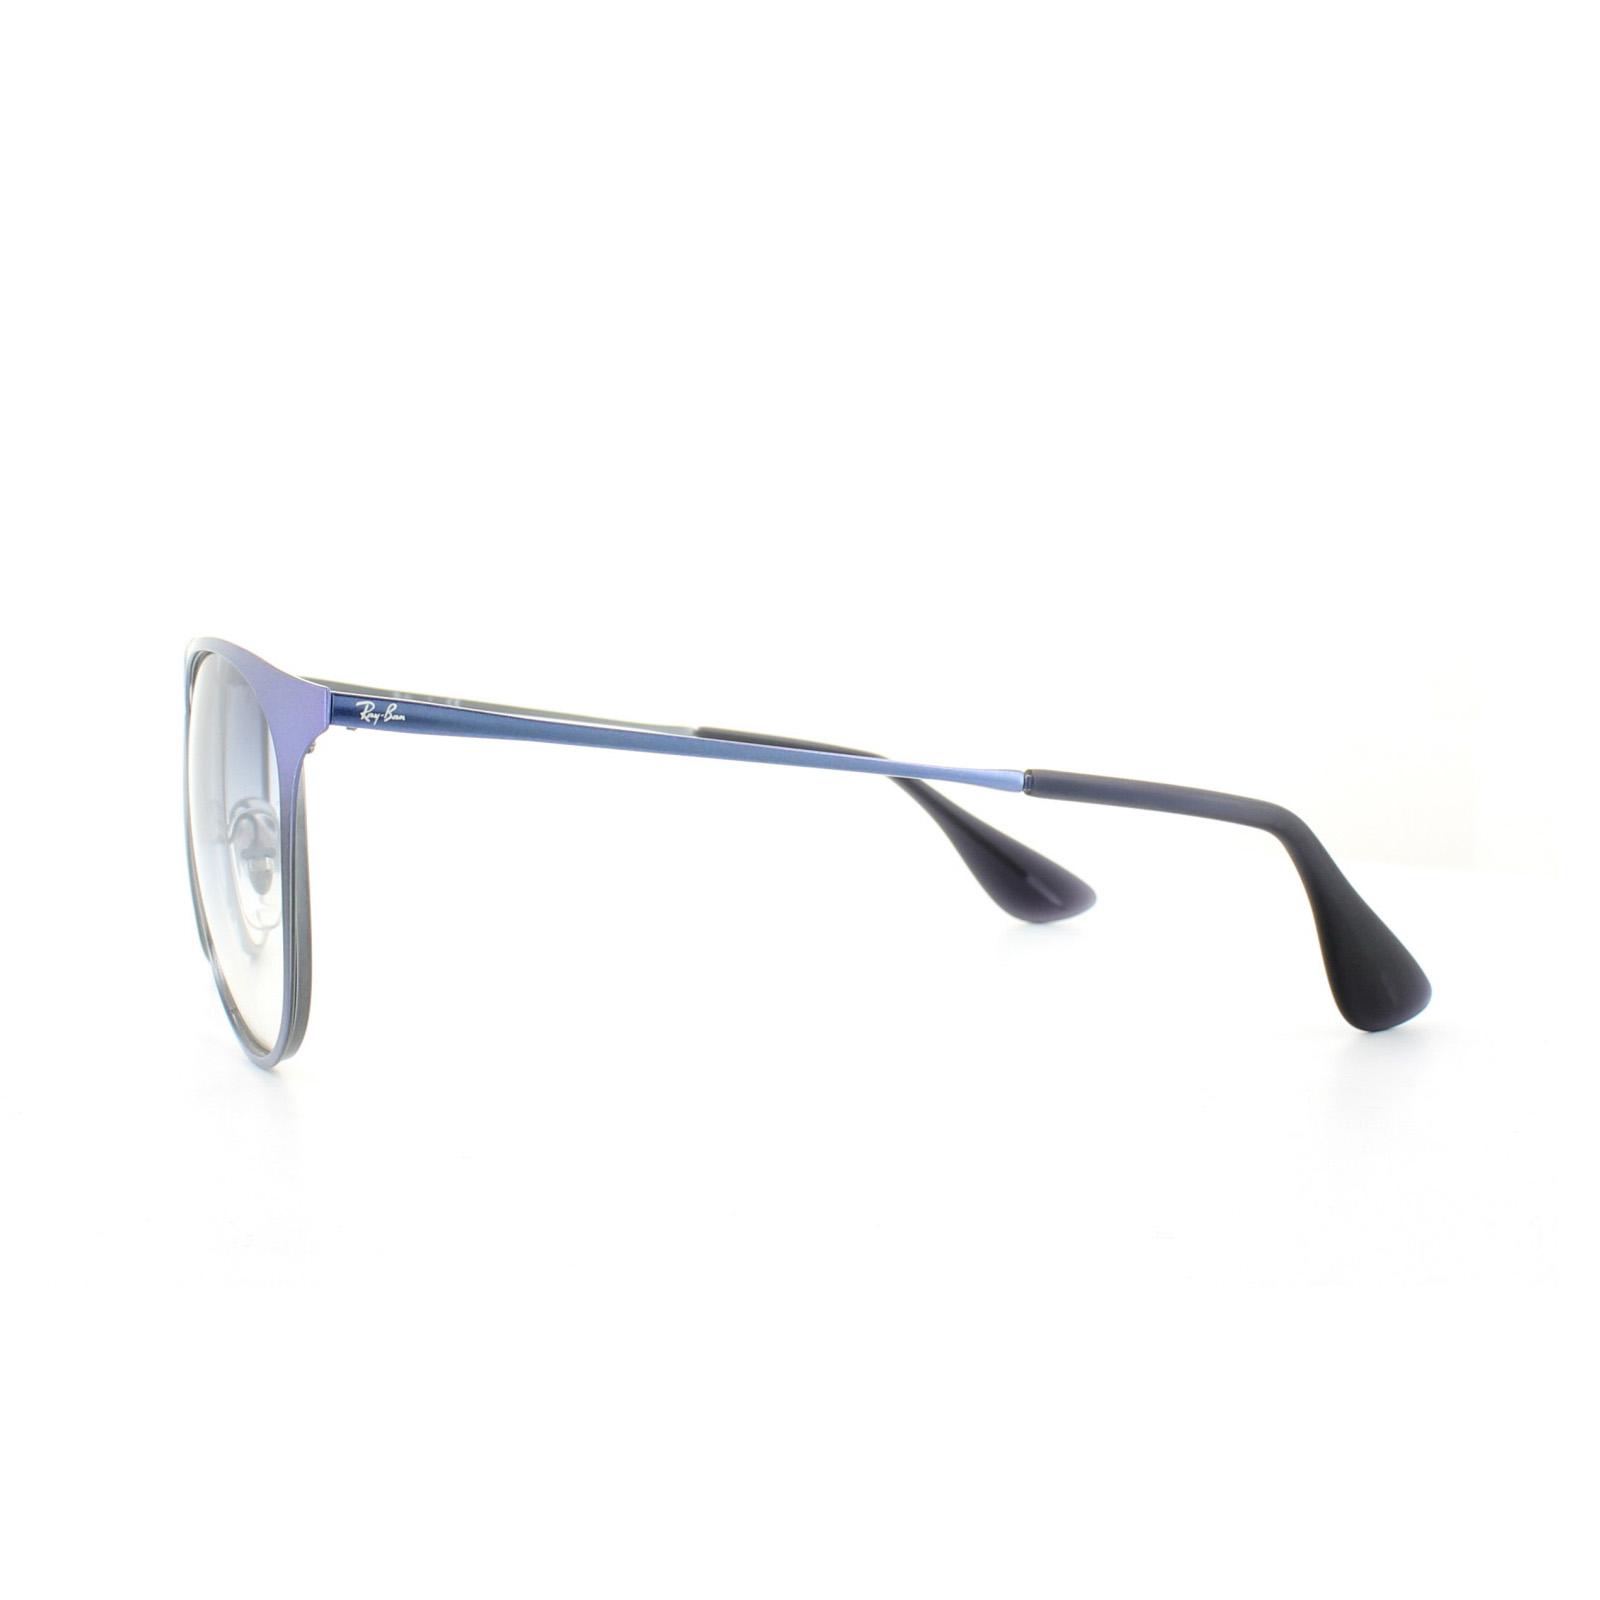 8841a3dc93e Sentinel Ray-Ban Sunglasses Erika Metal 3539 194 19 Metalic Shot Blue Light  Blue Gradient